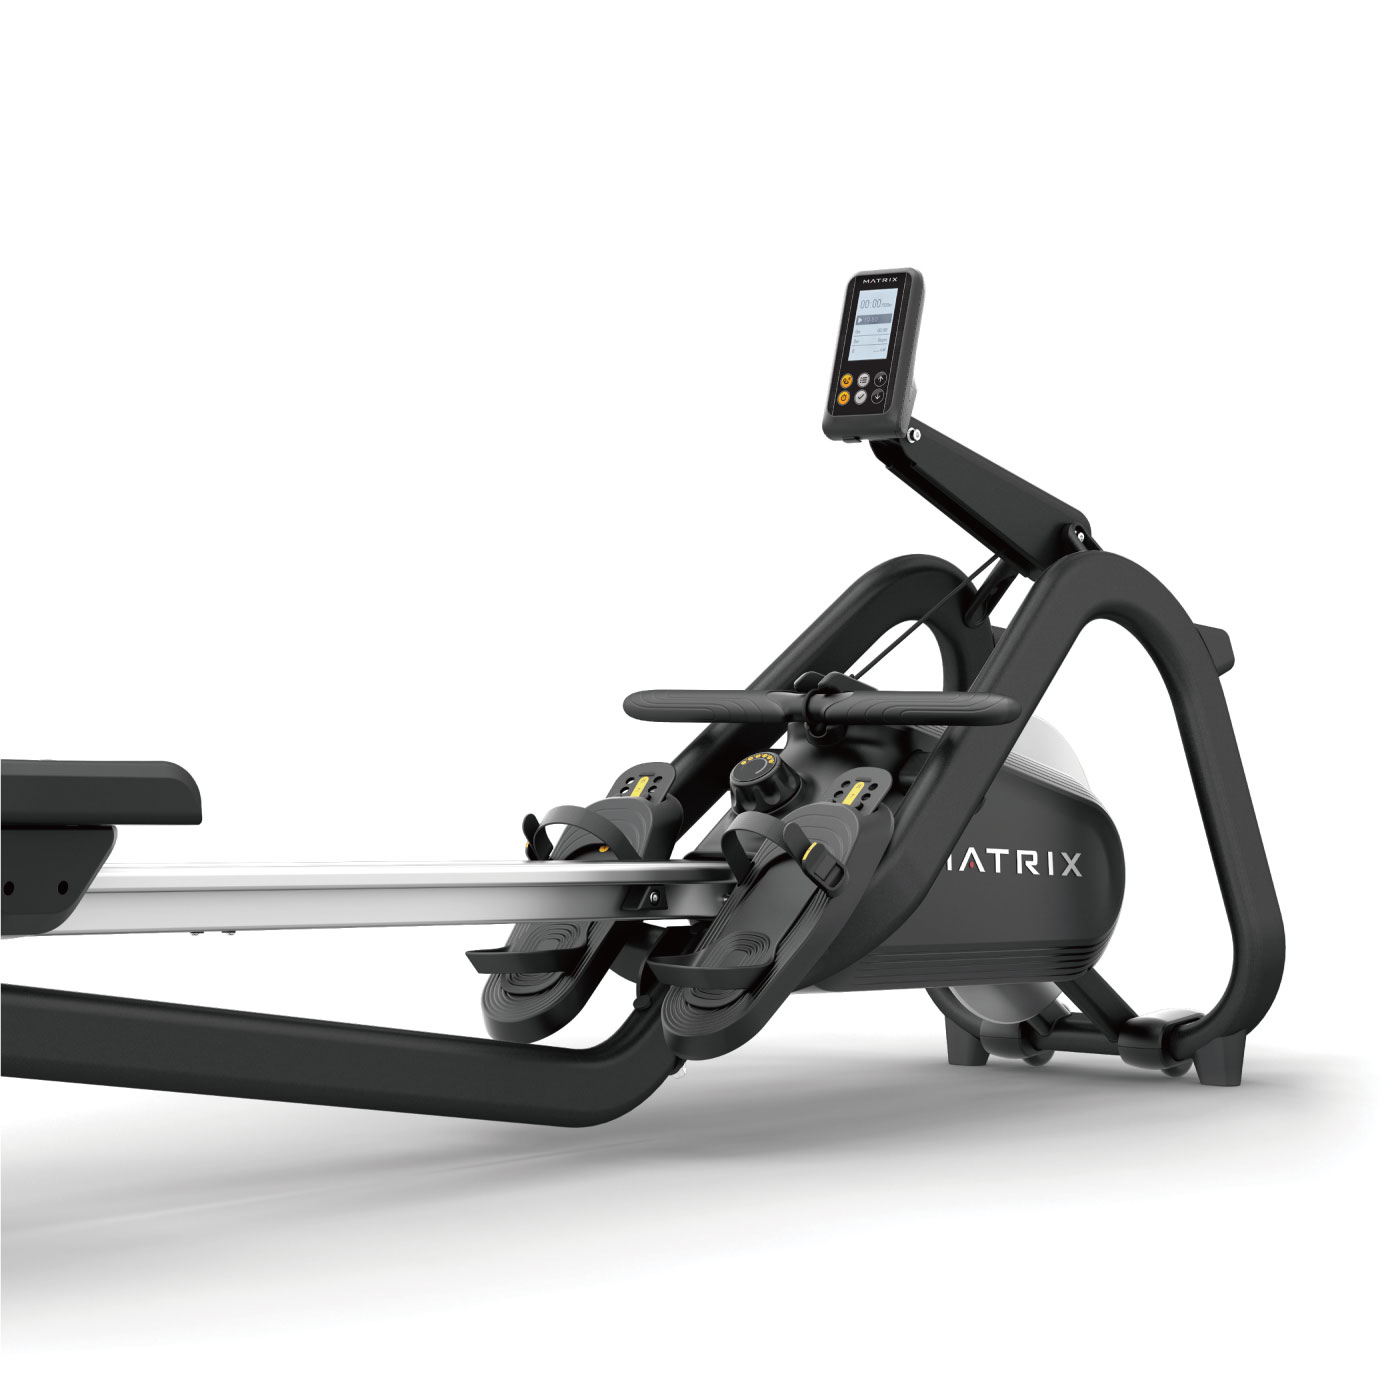 Rower(ローアー)/ローイングマシン〈業務用MATRIX〉《ジョンソンヘルステック》